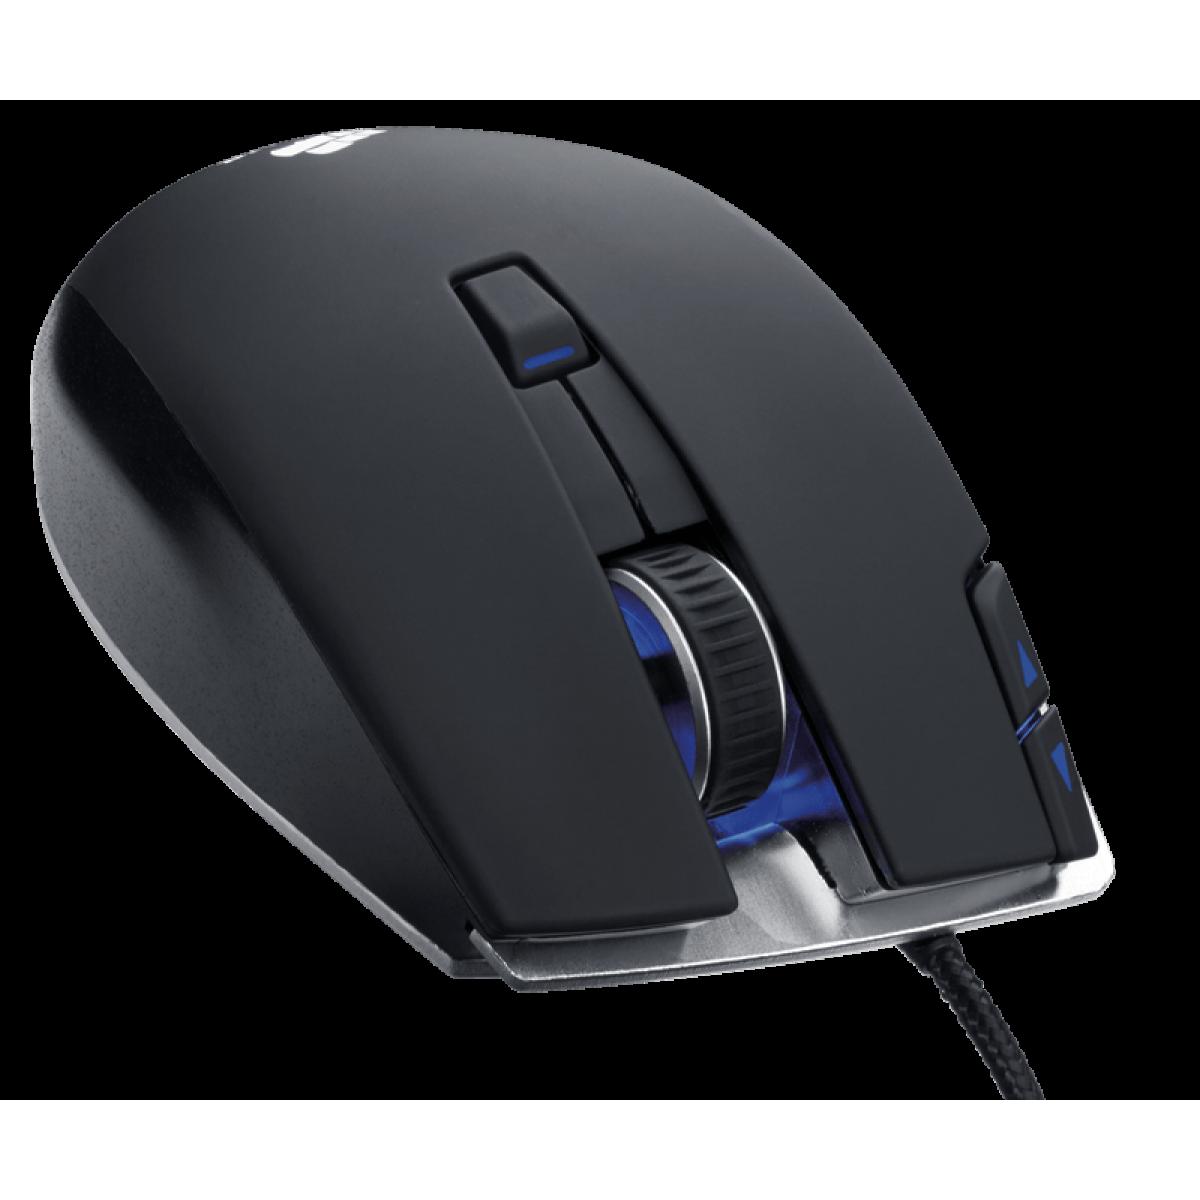 Mouse Corsair Vengeance M95 MMO/RTS Gunmetal Black CH-9000025-NA 8200DPI - USB